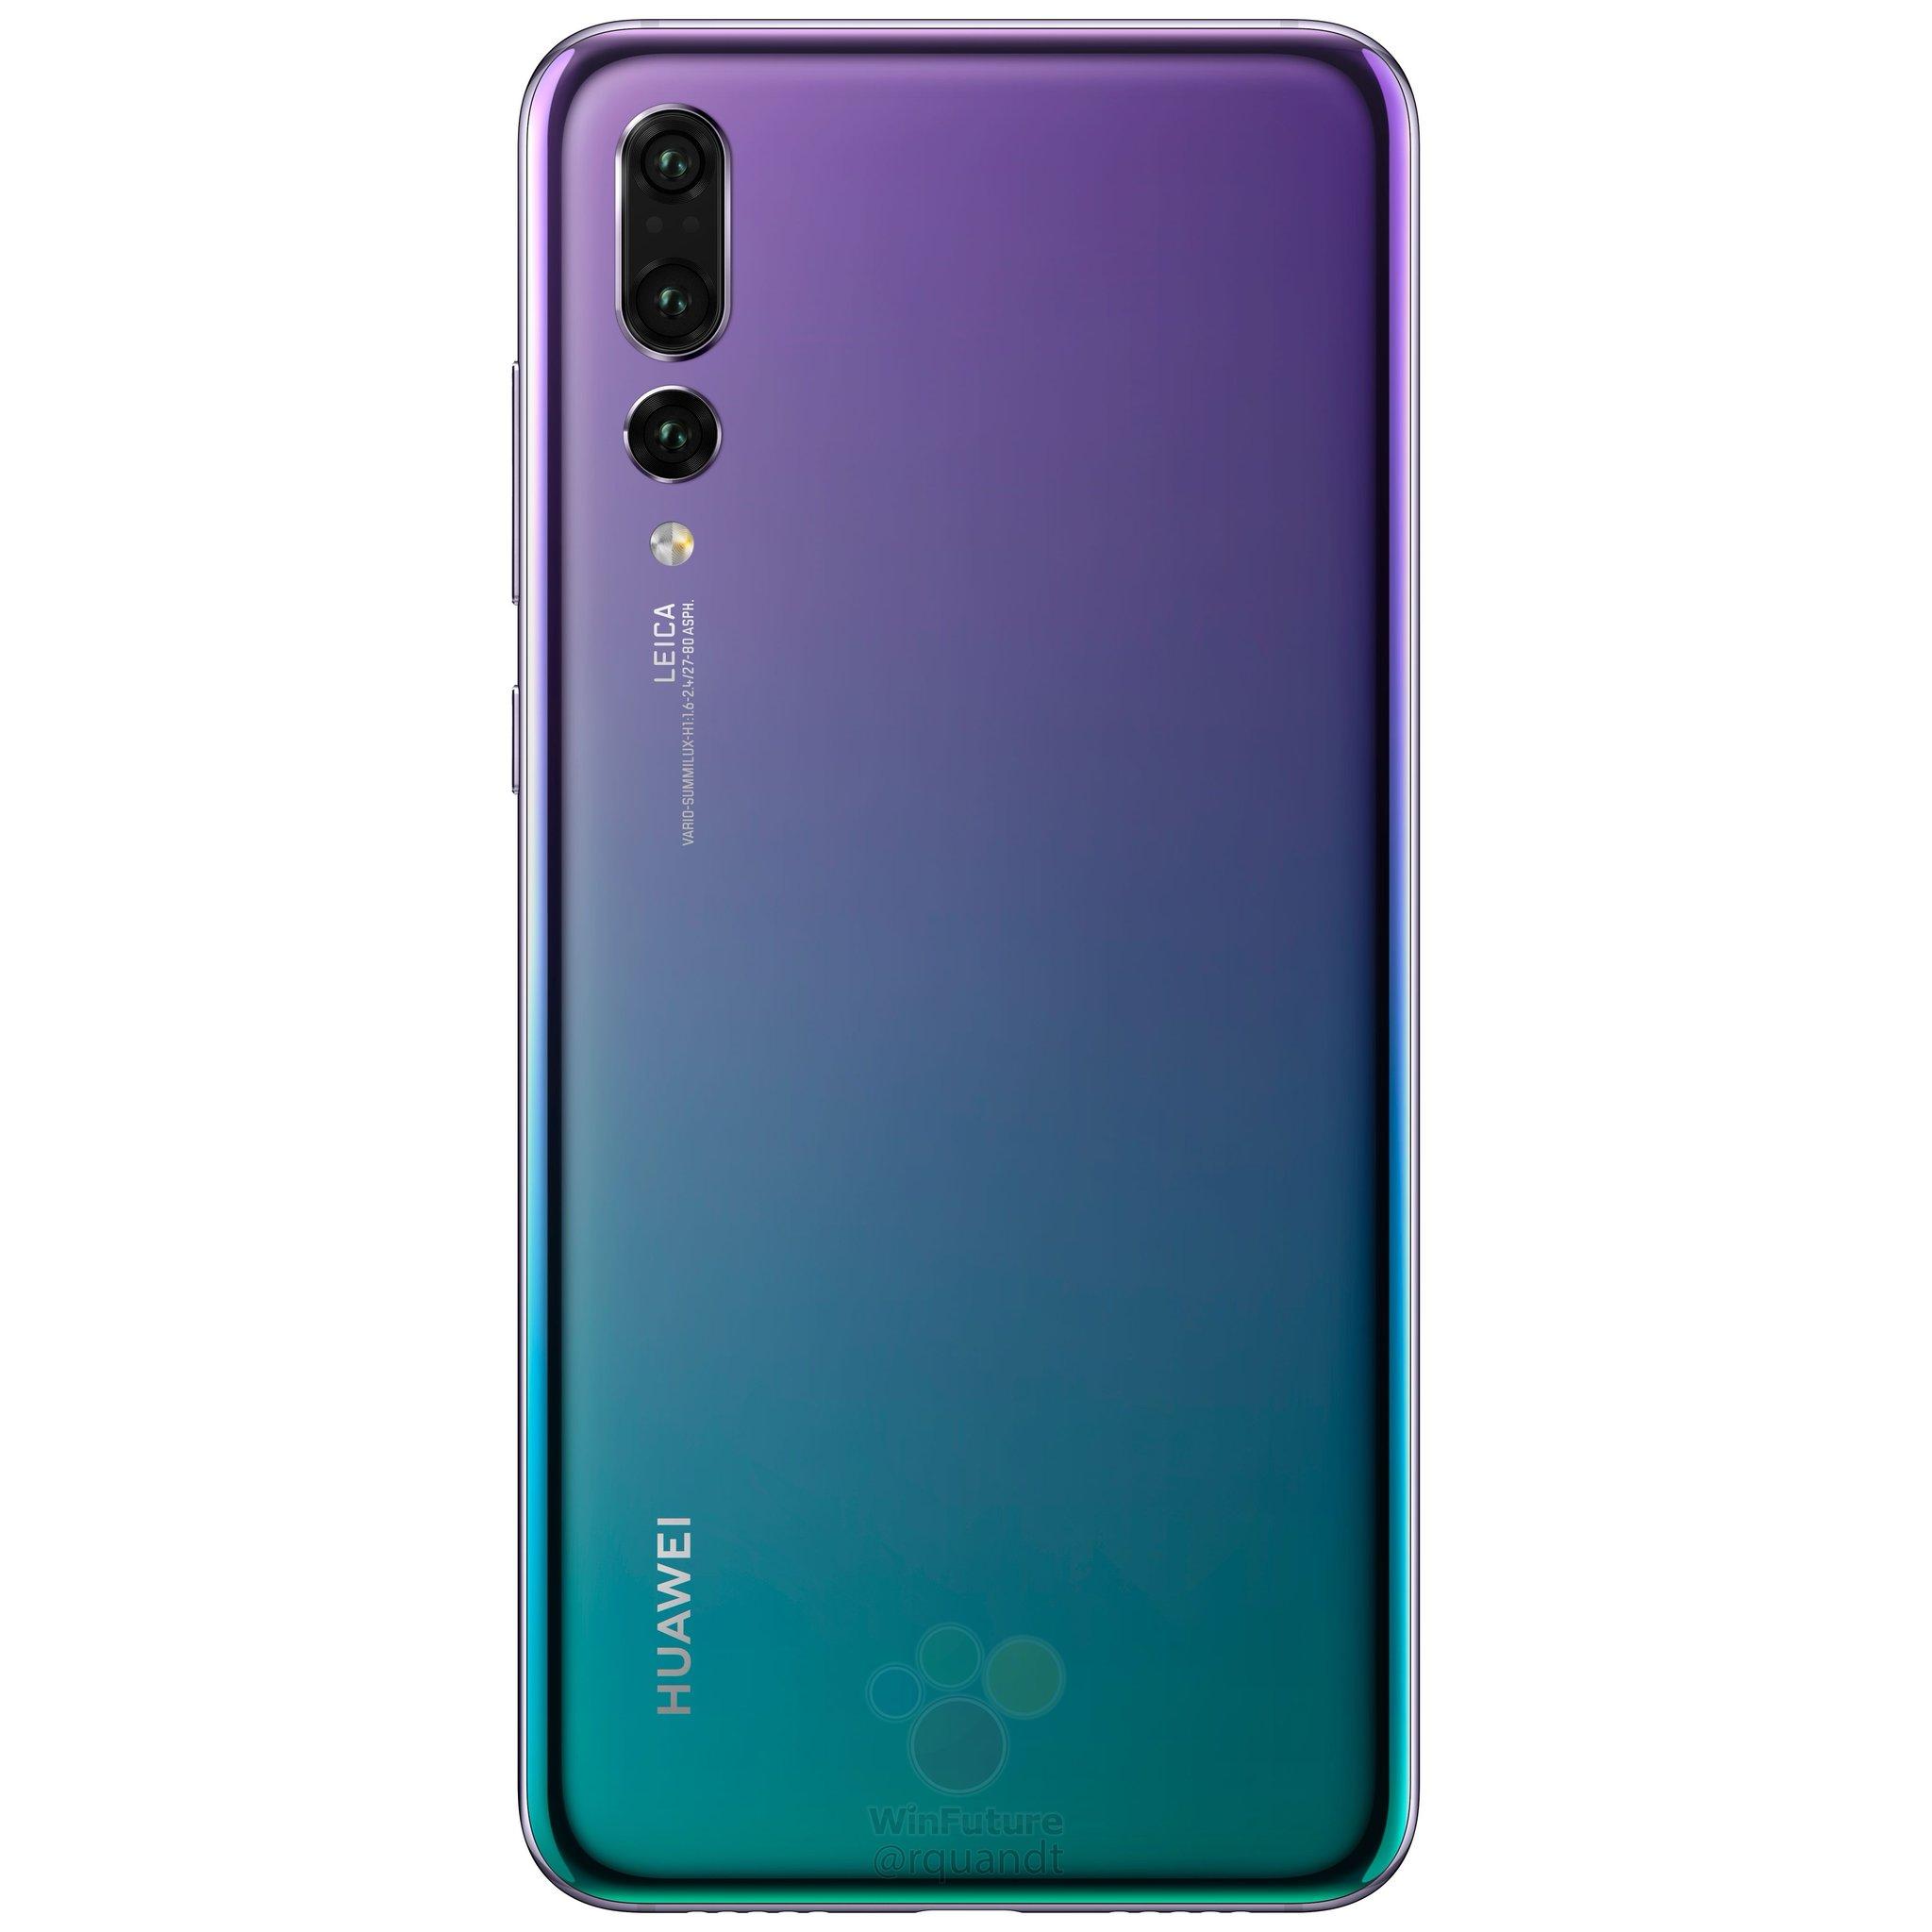 Huawei p20 pro 64gb price in ksa 5 6 2  Сlick here